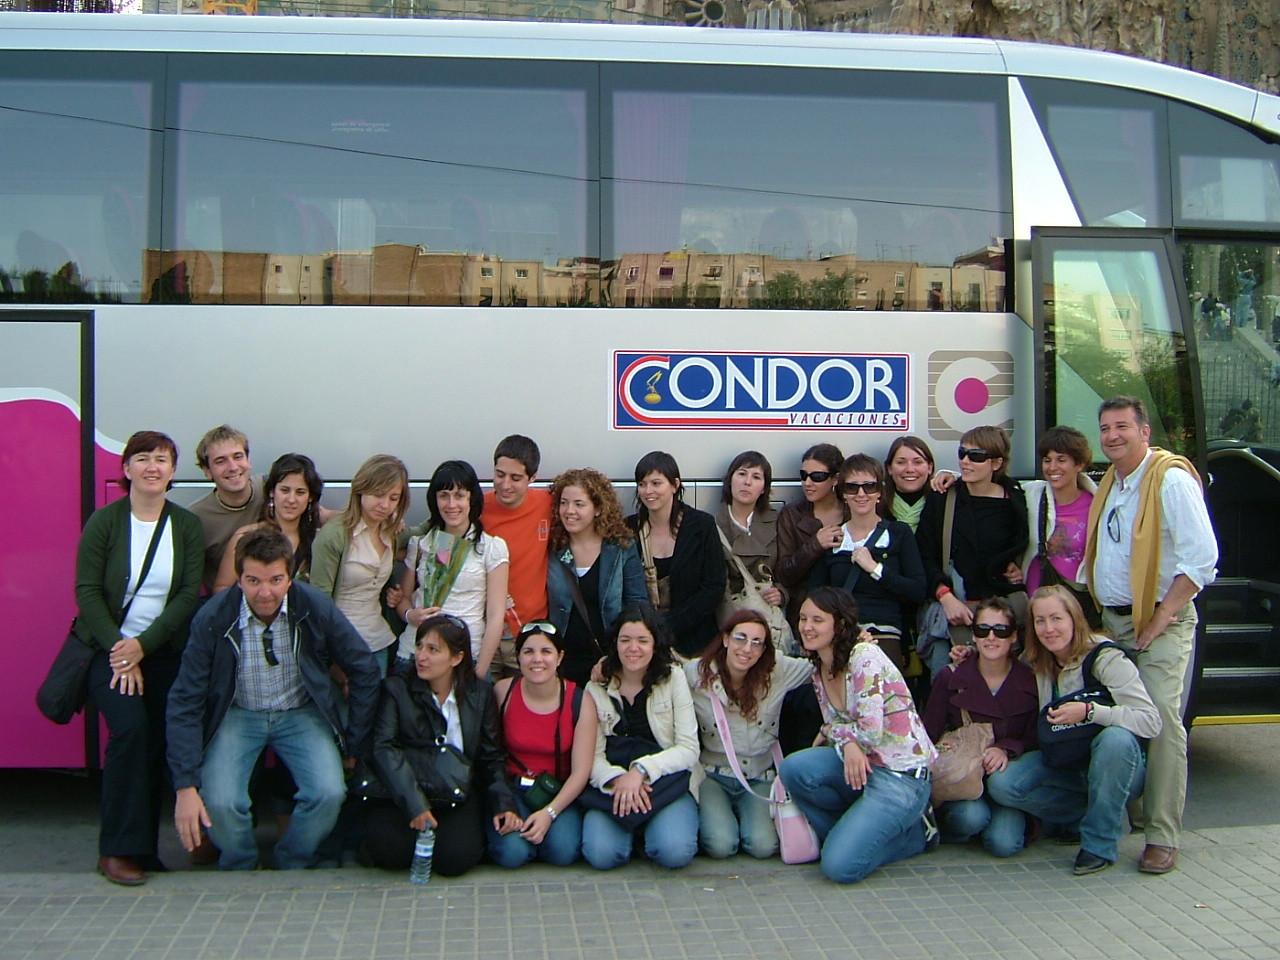 2005. Despedida en Barcelona